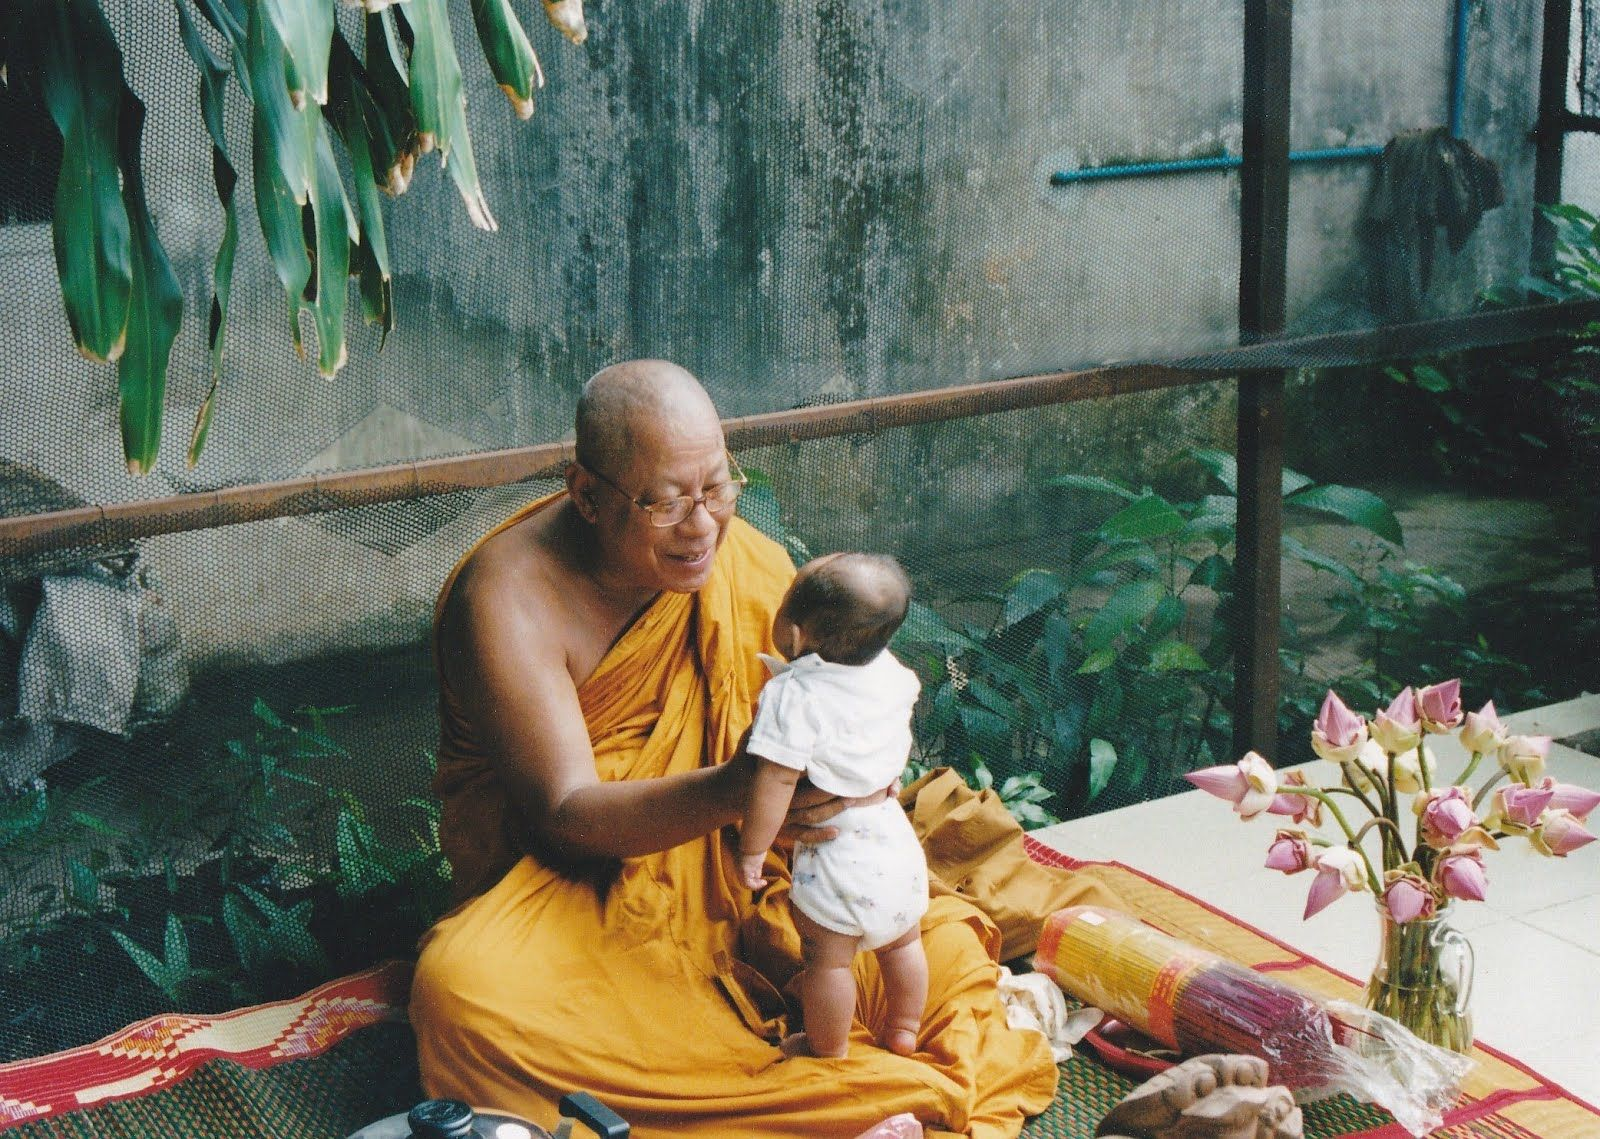 eccb351c3 jouljet: Khmer Baby Naming Ceremony   All things beautiful ...